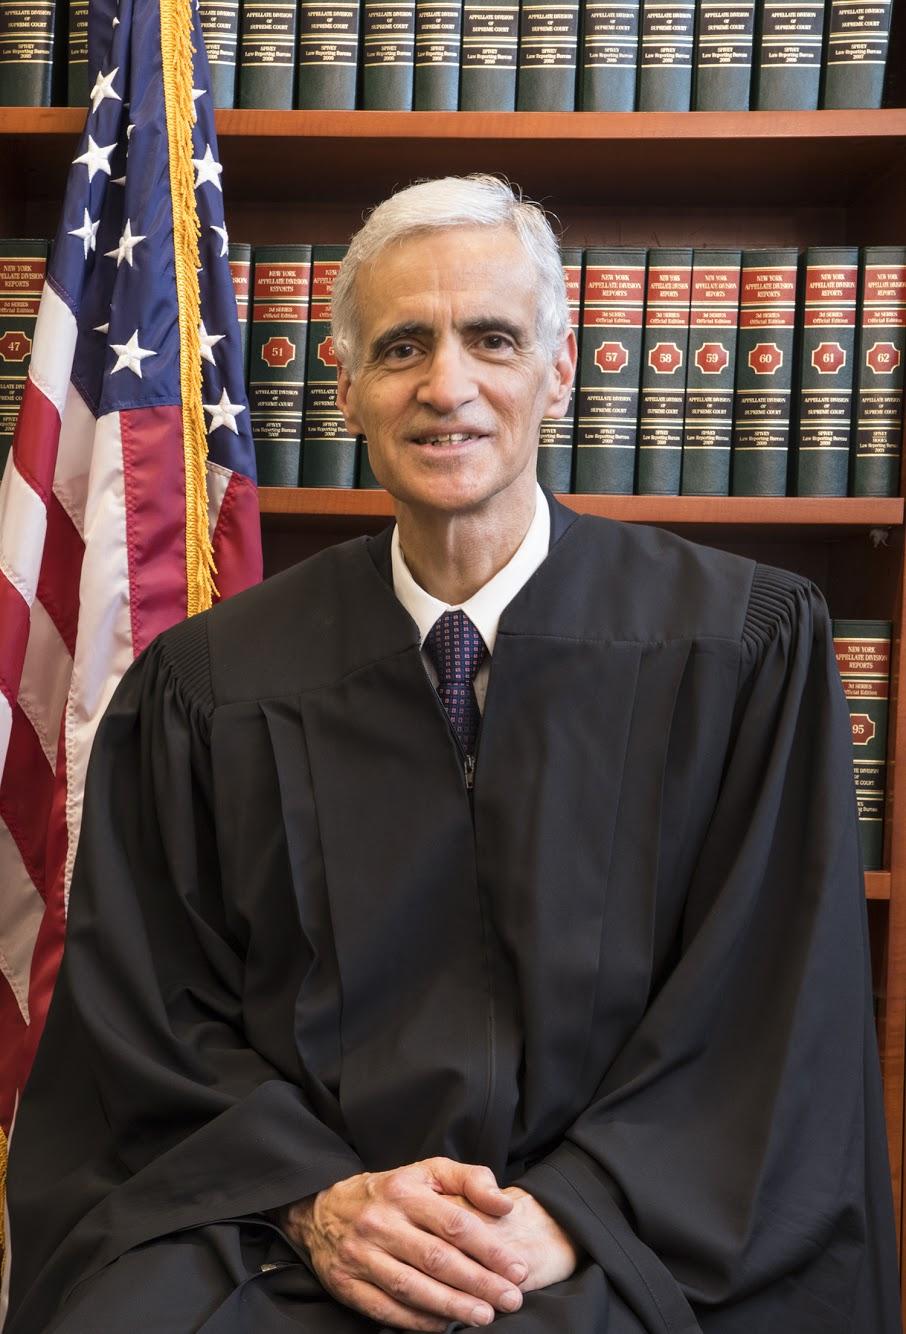 The Columbian Lawyers Association's 2019 Rapallo/Scalia Award Winner – Justice Nicholas Iacovetta